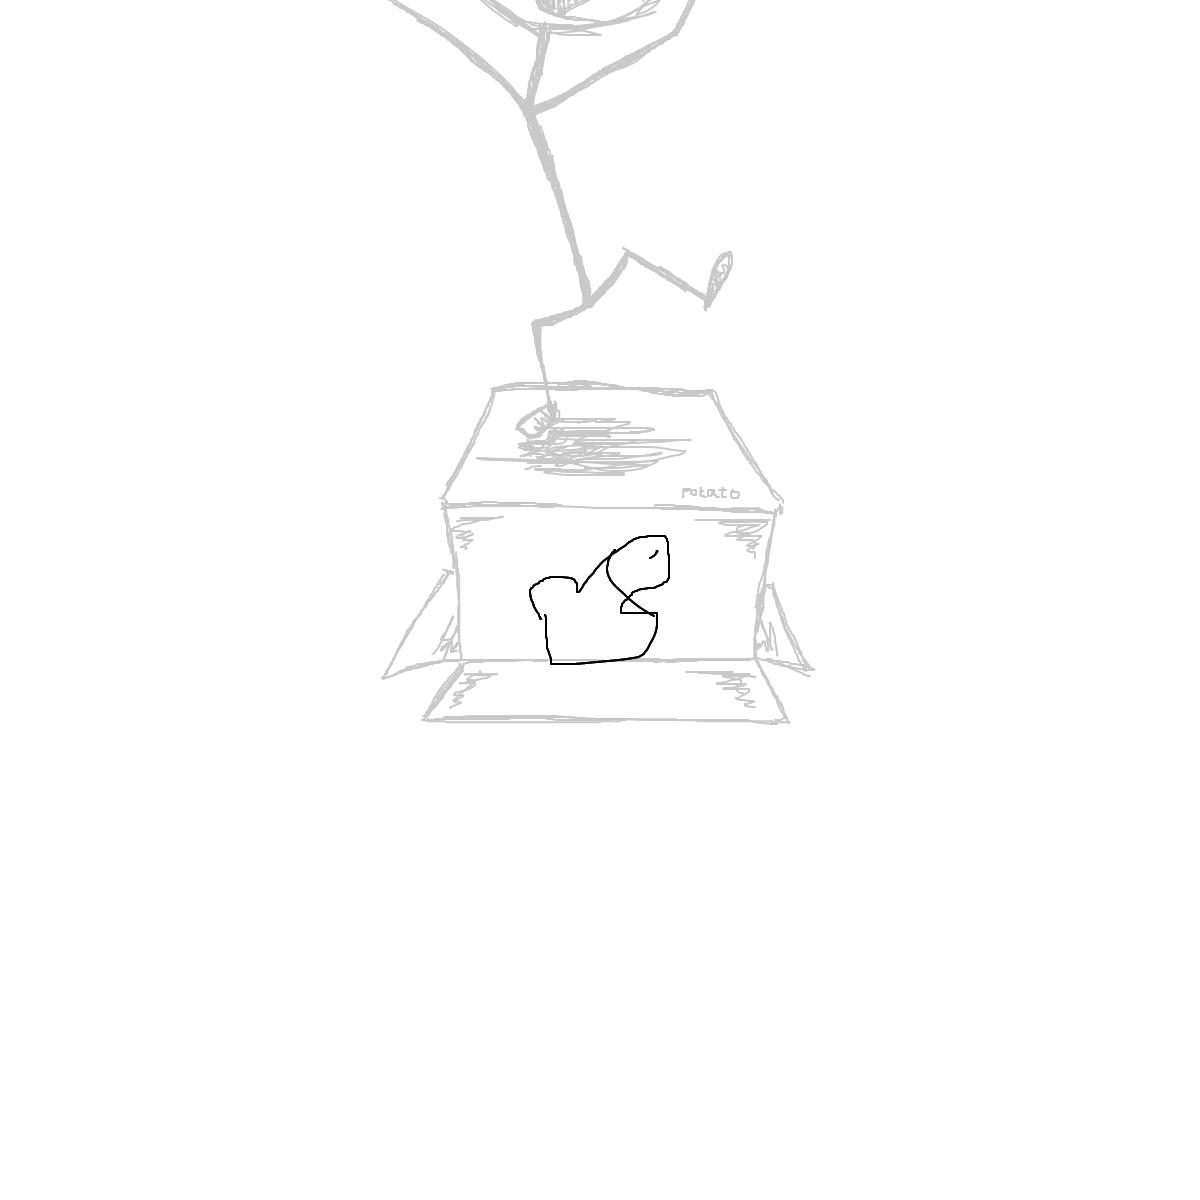 BAAAM drawing#20557 lat:40.4813041687011700lng: -74.0049896240234400